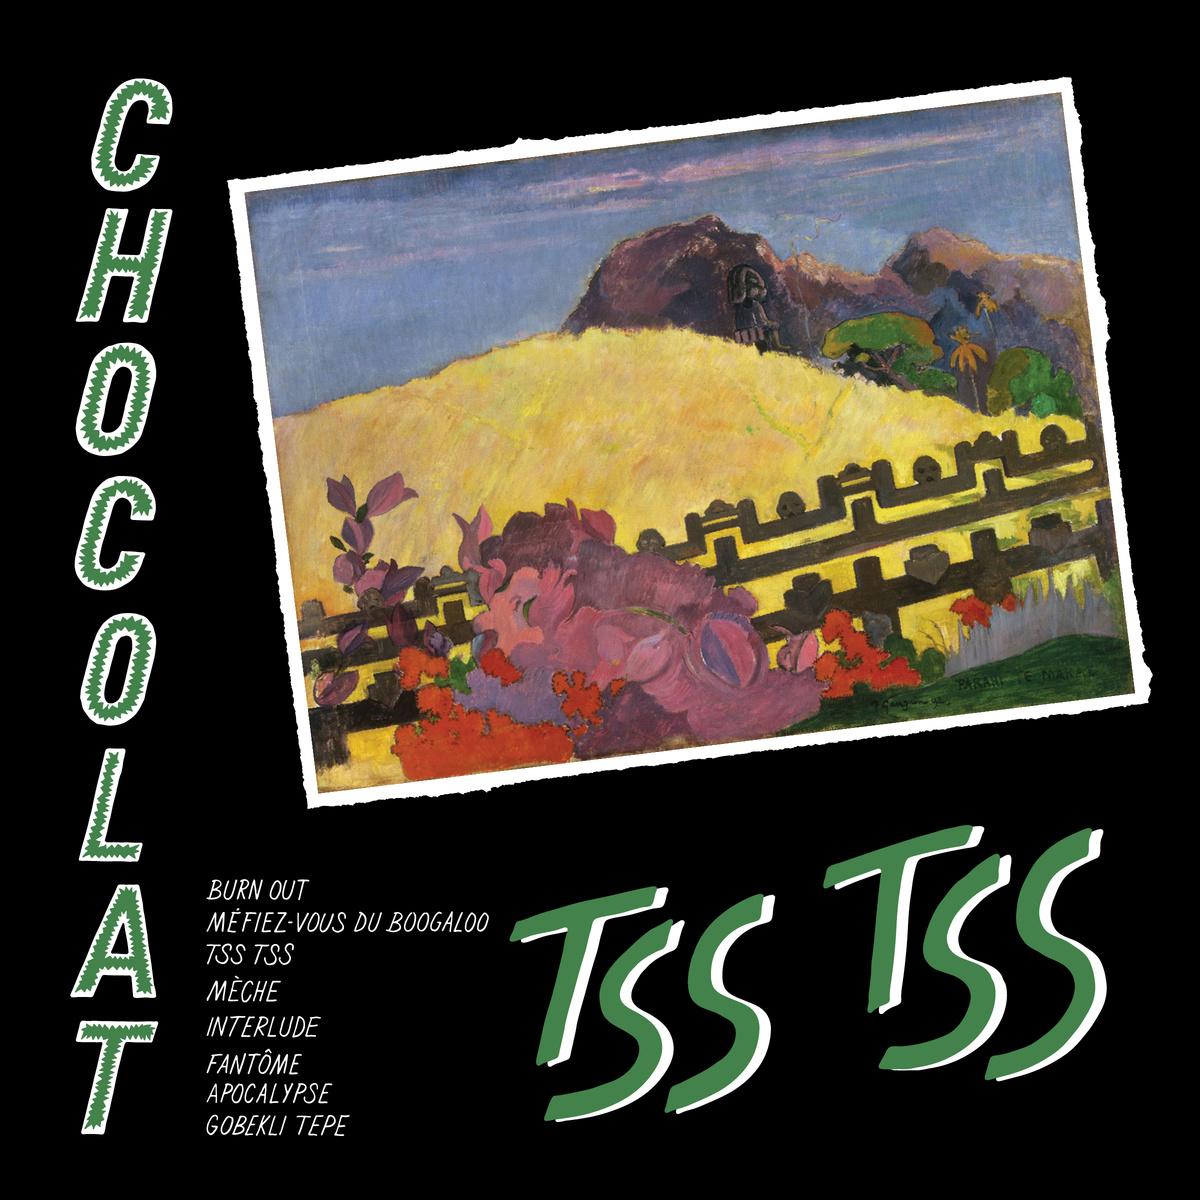 Soirée psyché 70's avec Chocolat